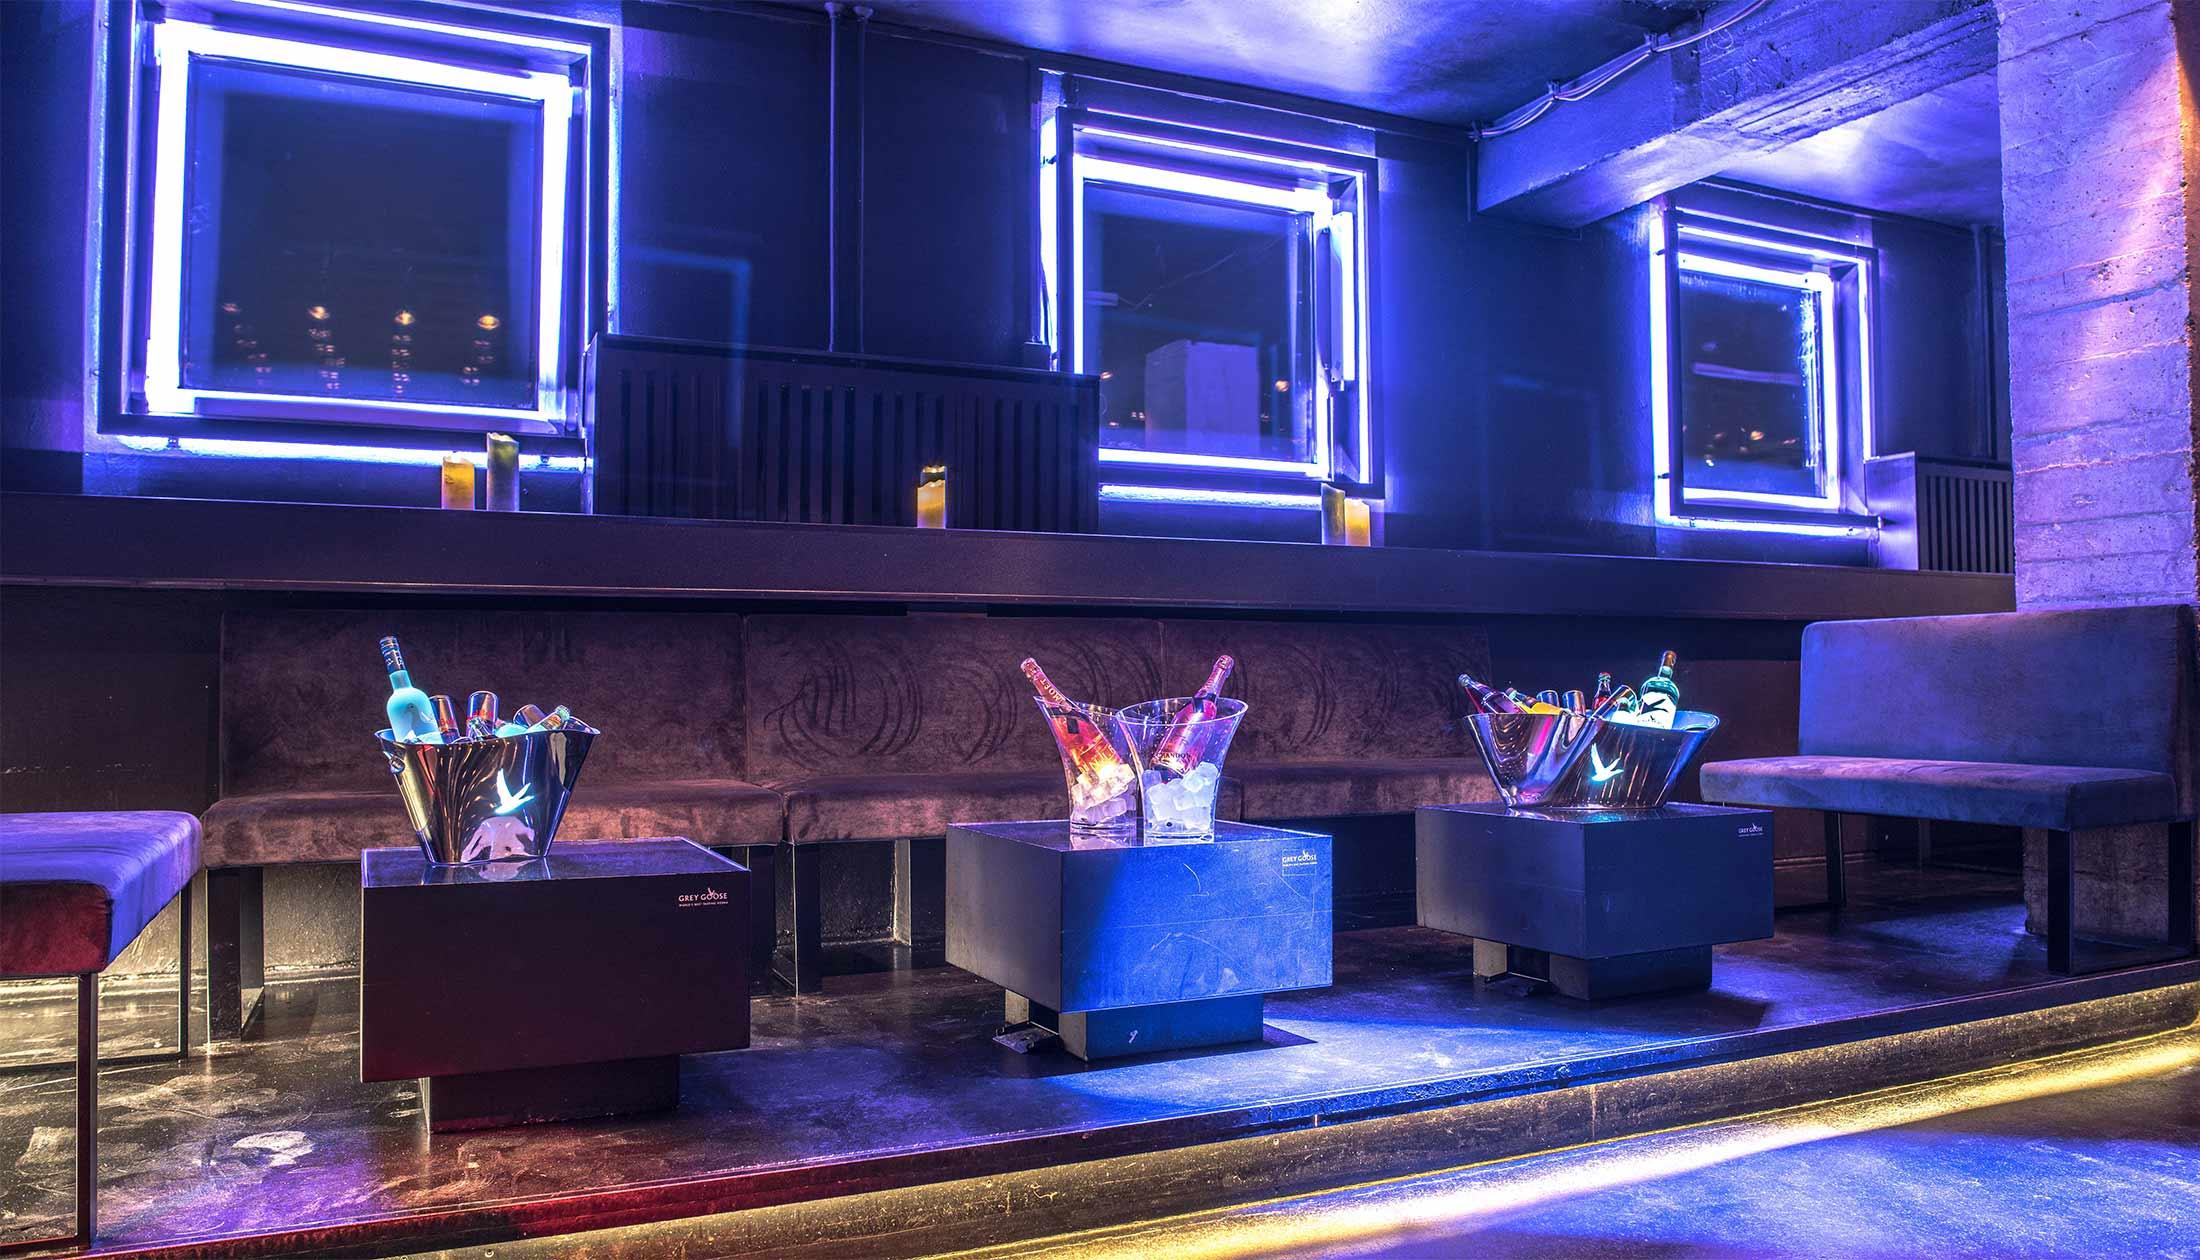 Berlin Techno Clubs Underground House of Weekend